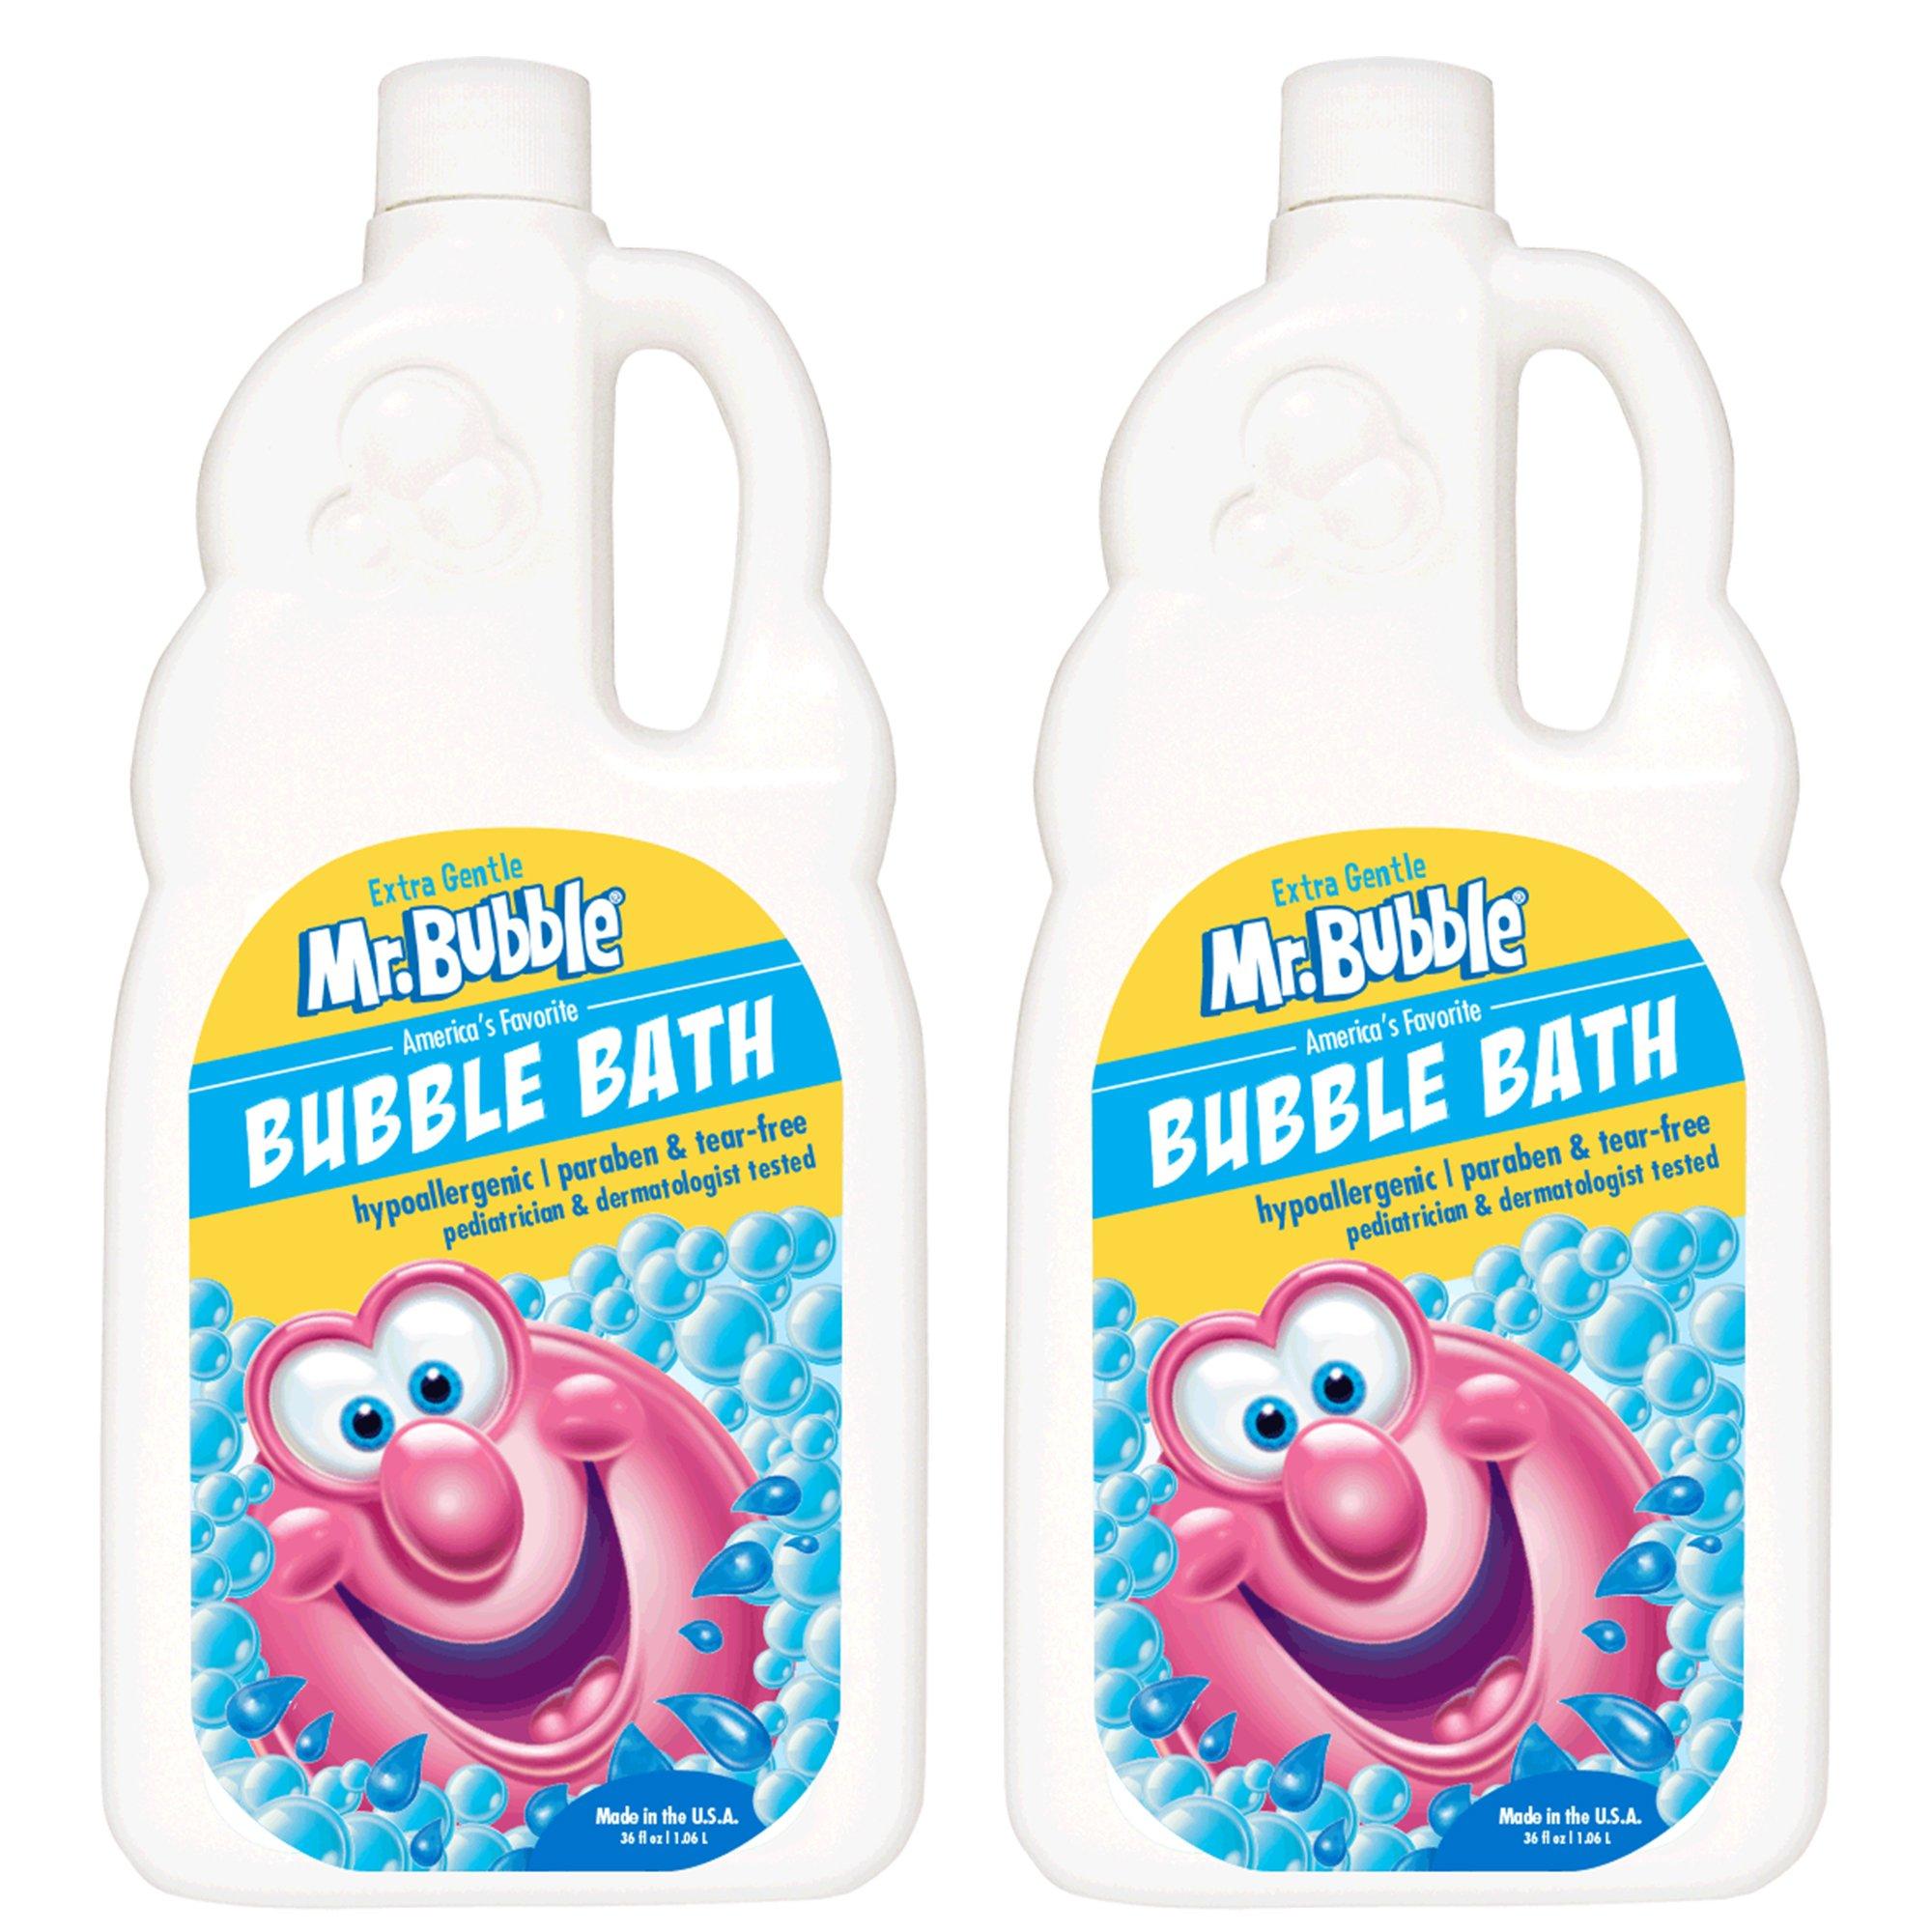 Mr. Bubble Bubble Bath, Extra Gentle, Fragrance-Free, 36 fl oz, Pack of 2 by Mr. Bubble